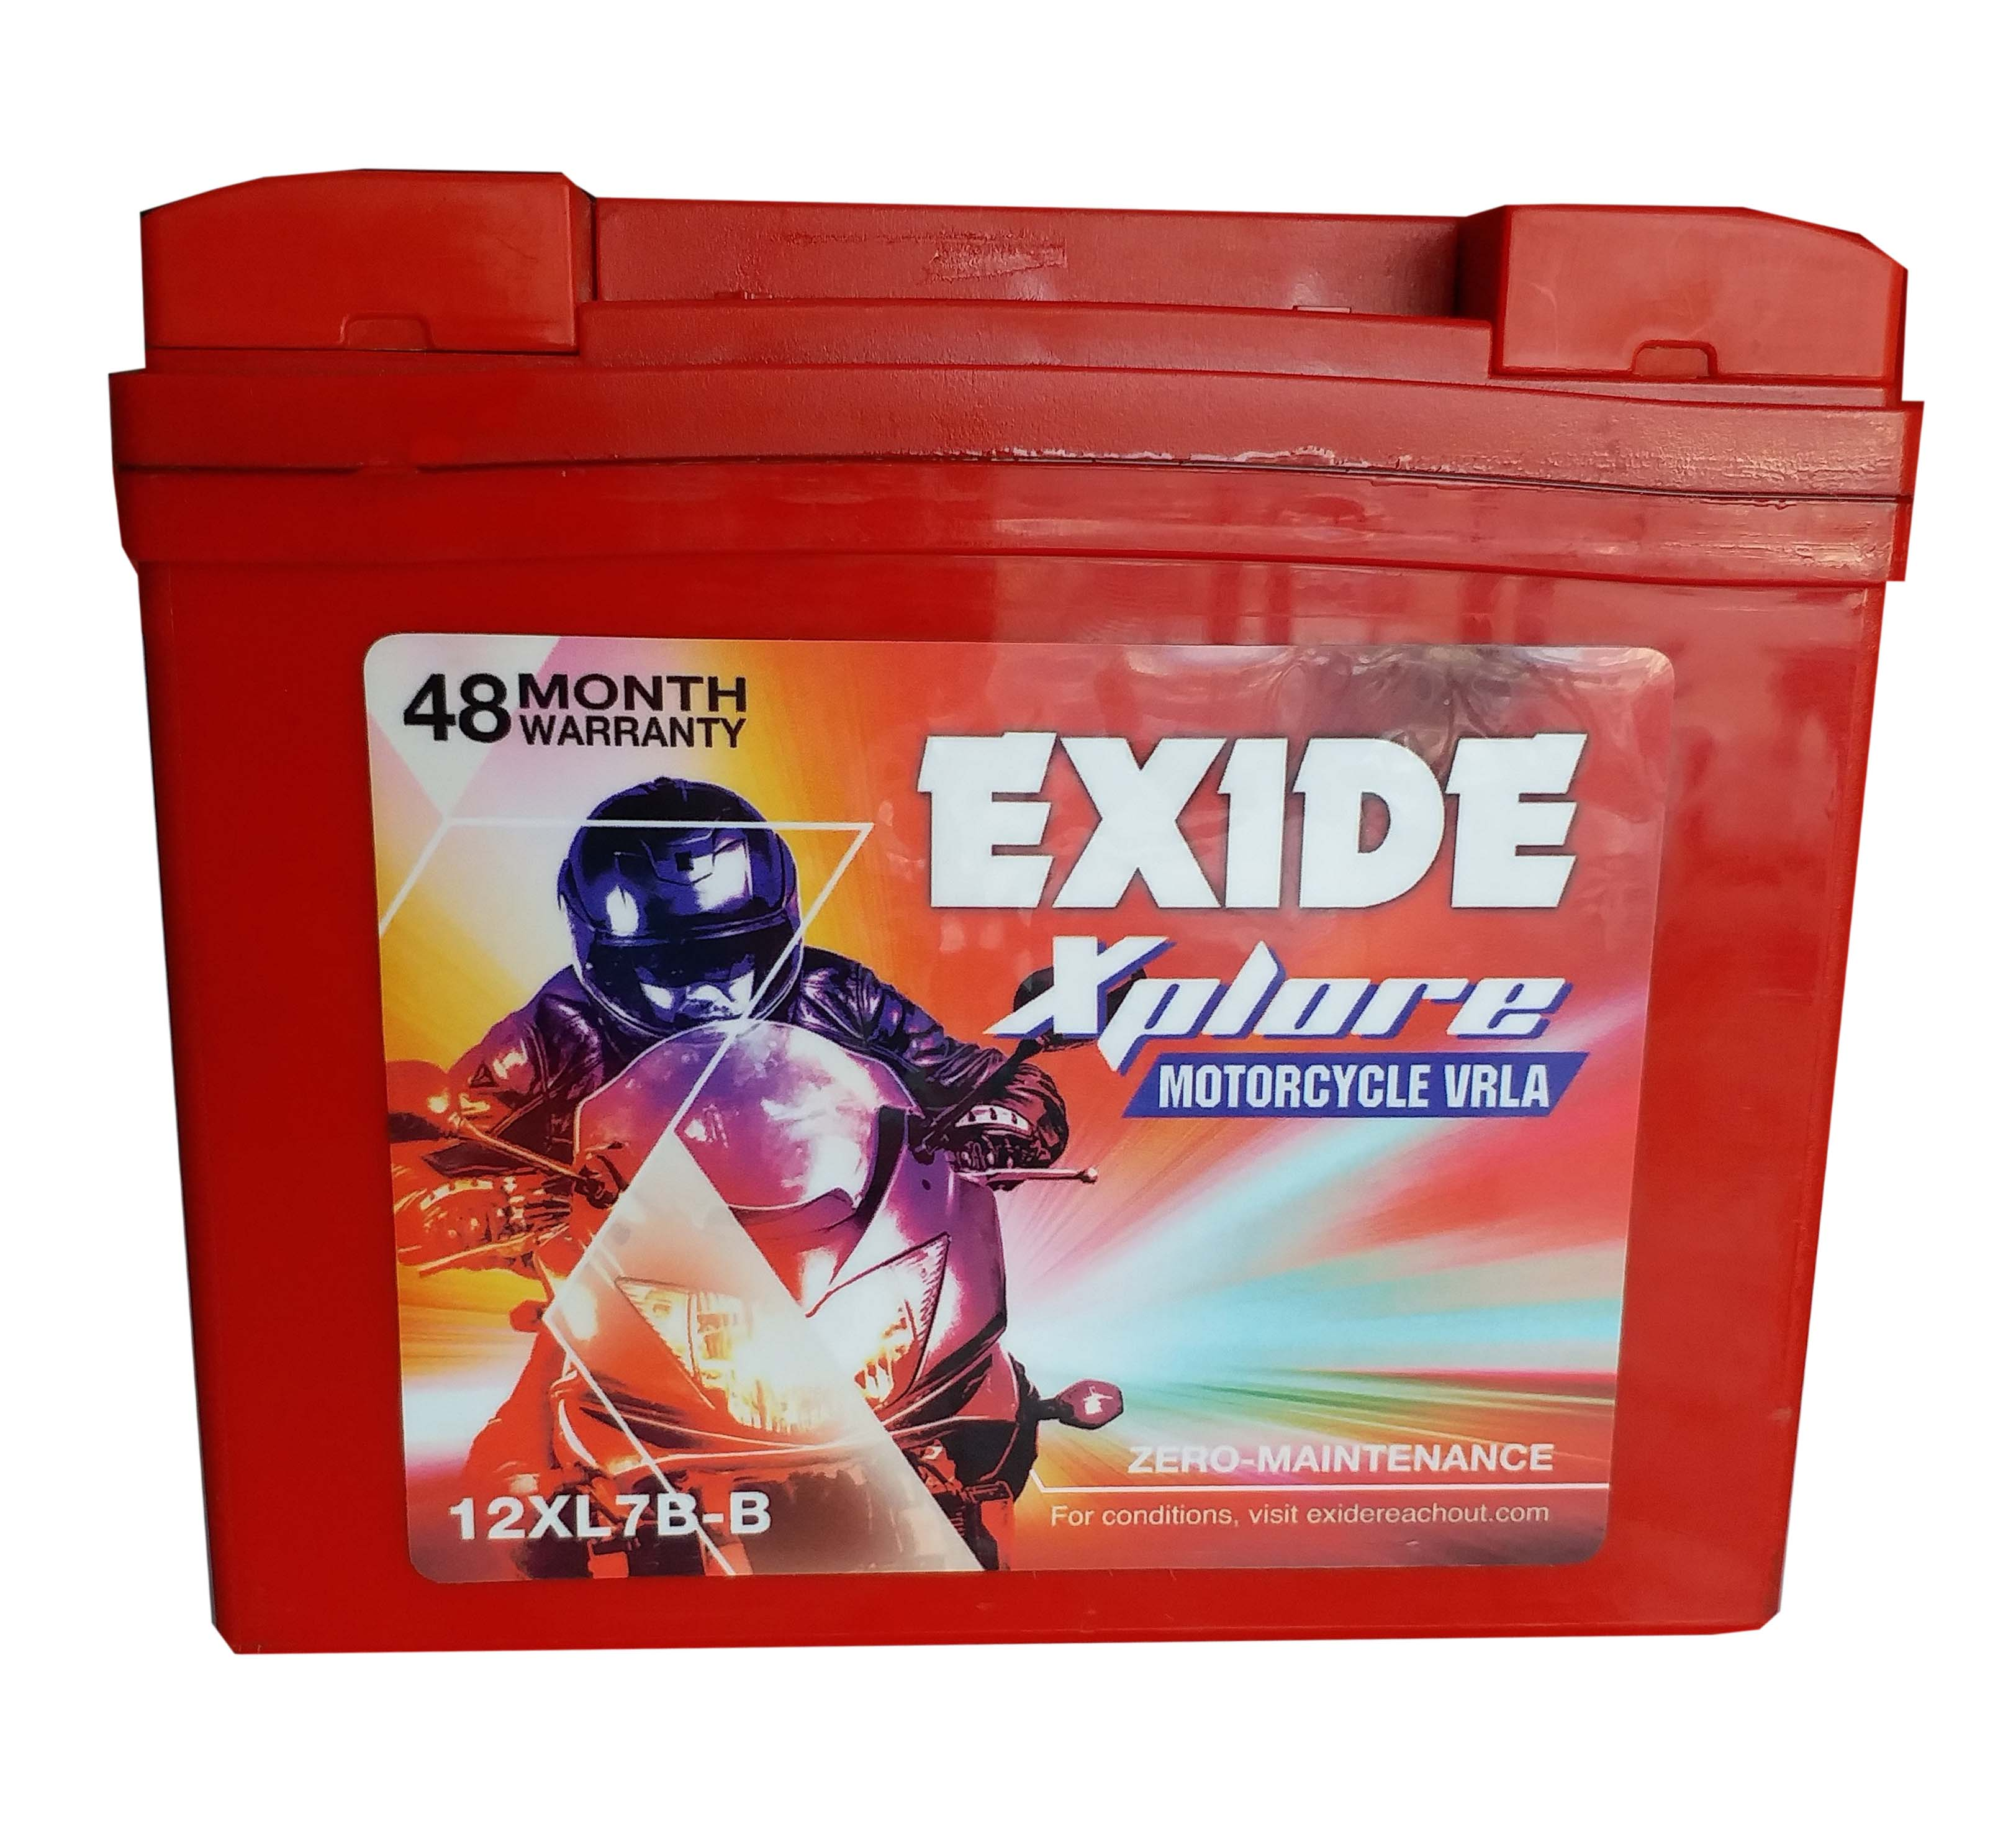 BUY Exide xplore mahindra duro , rodeo , discover 150 , pulsor 150 new model BATTERY 12xl7b-b